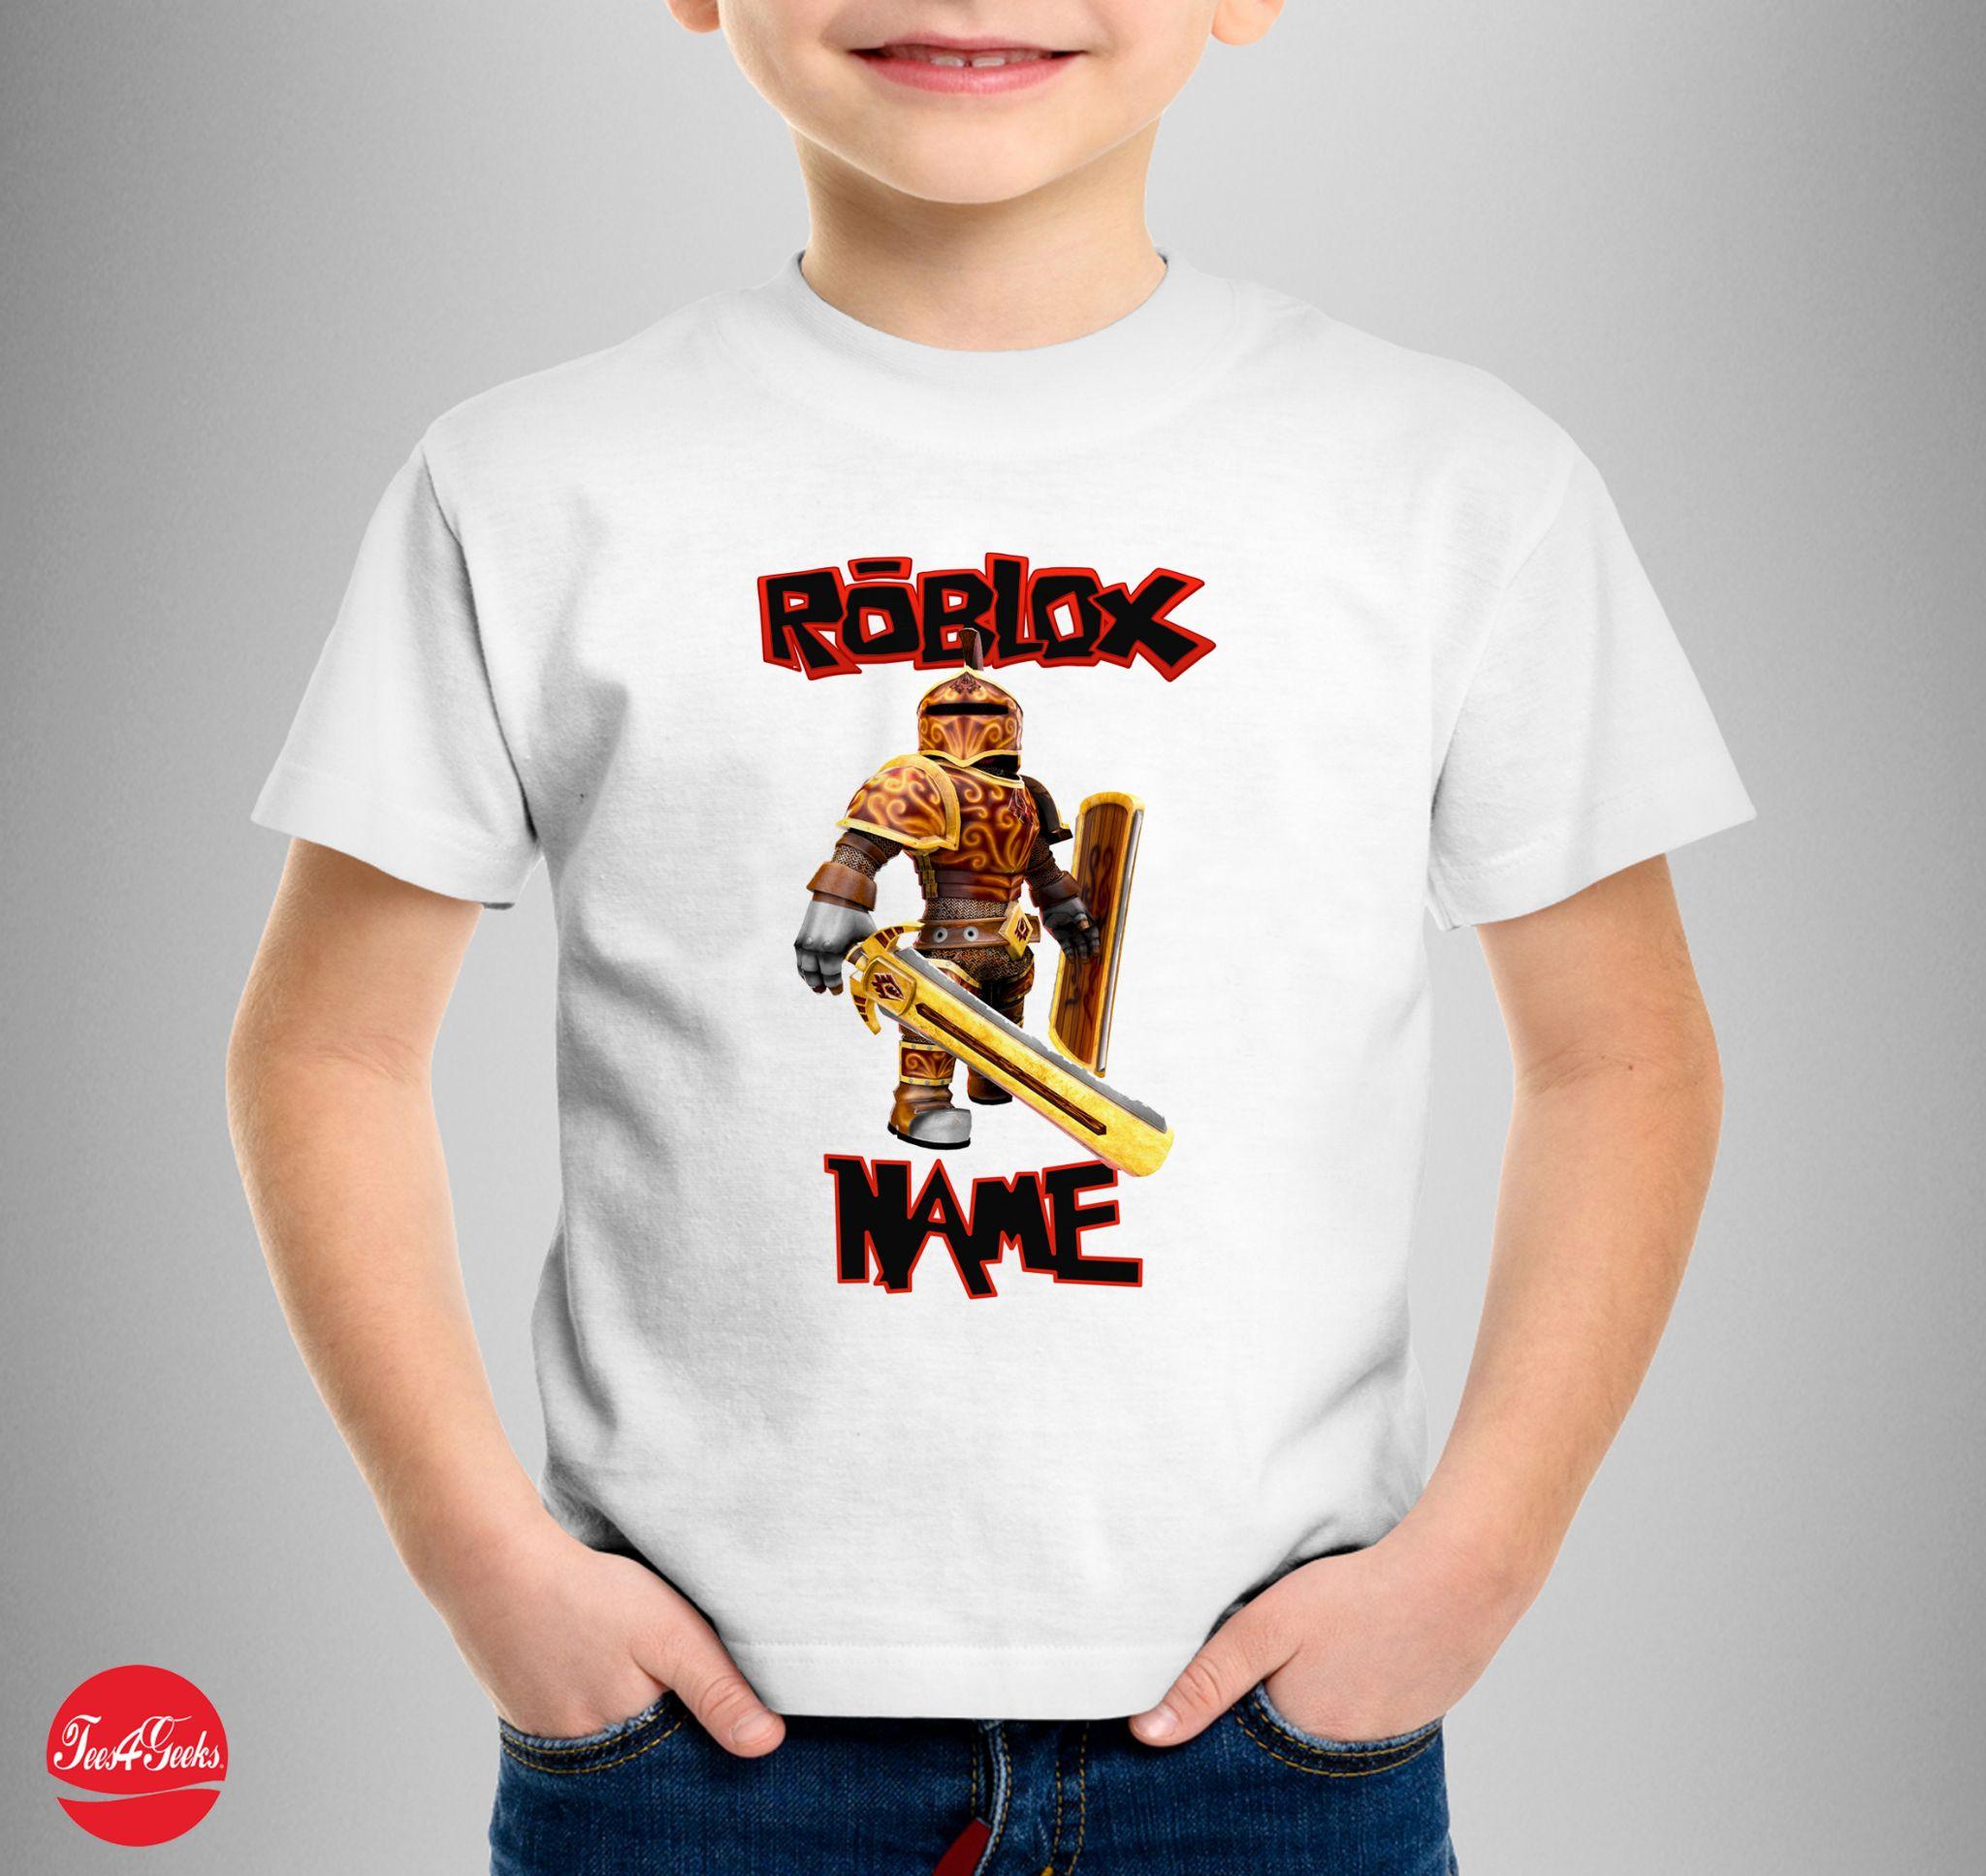 Roblox Shirt Shading Template Png.